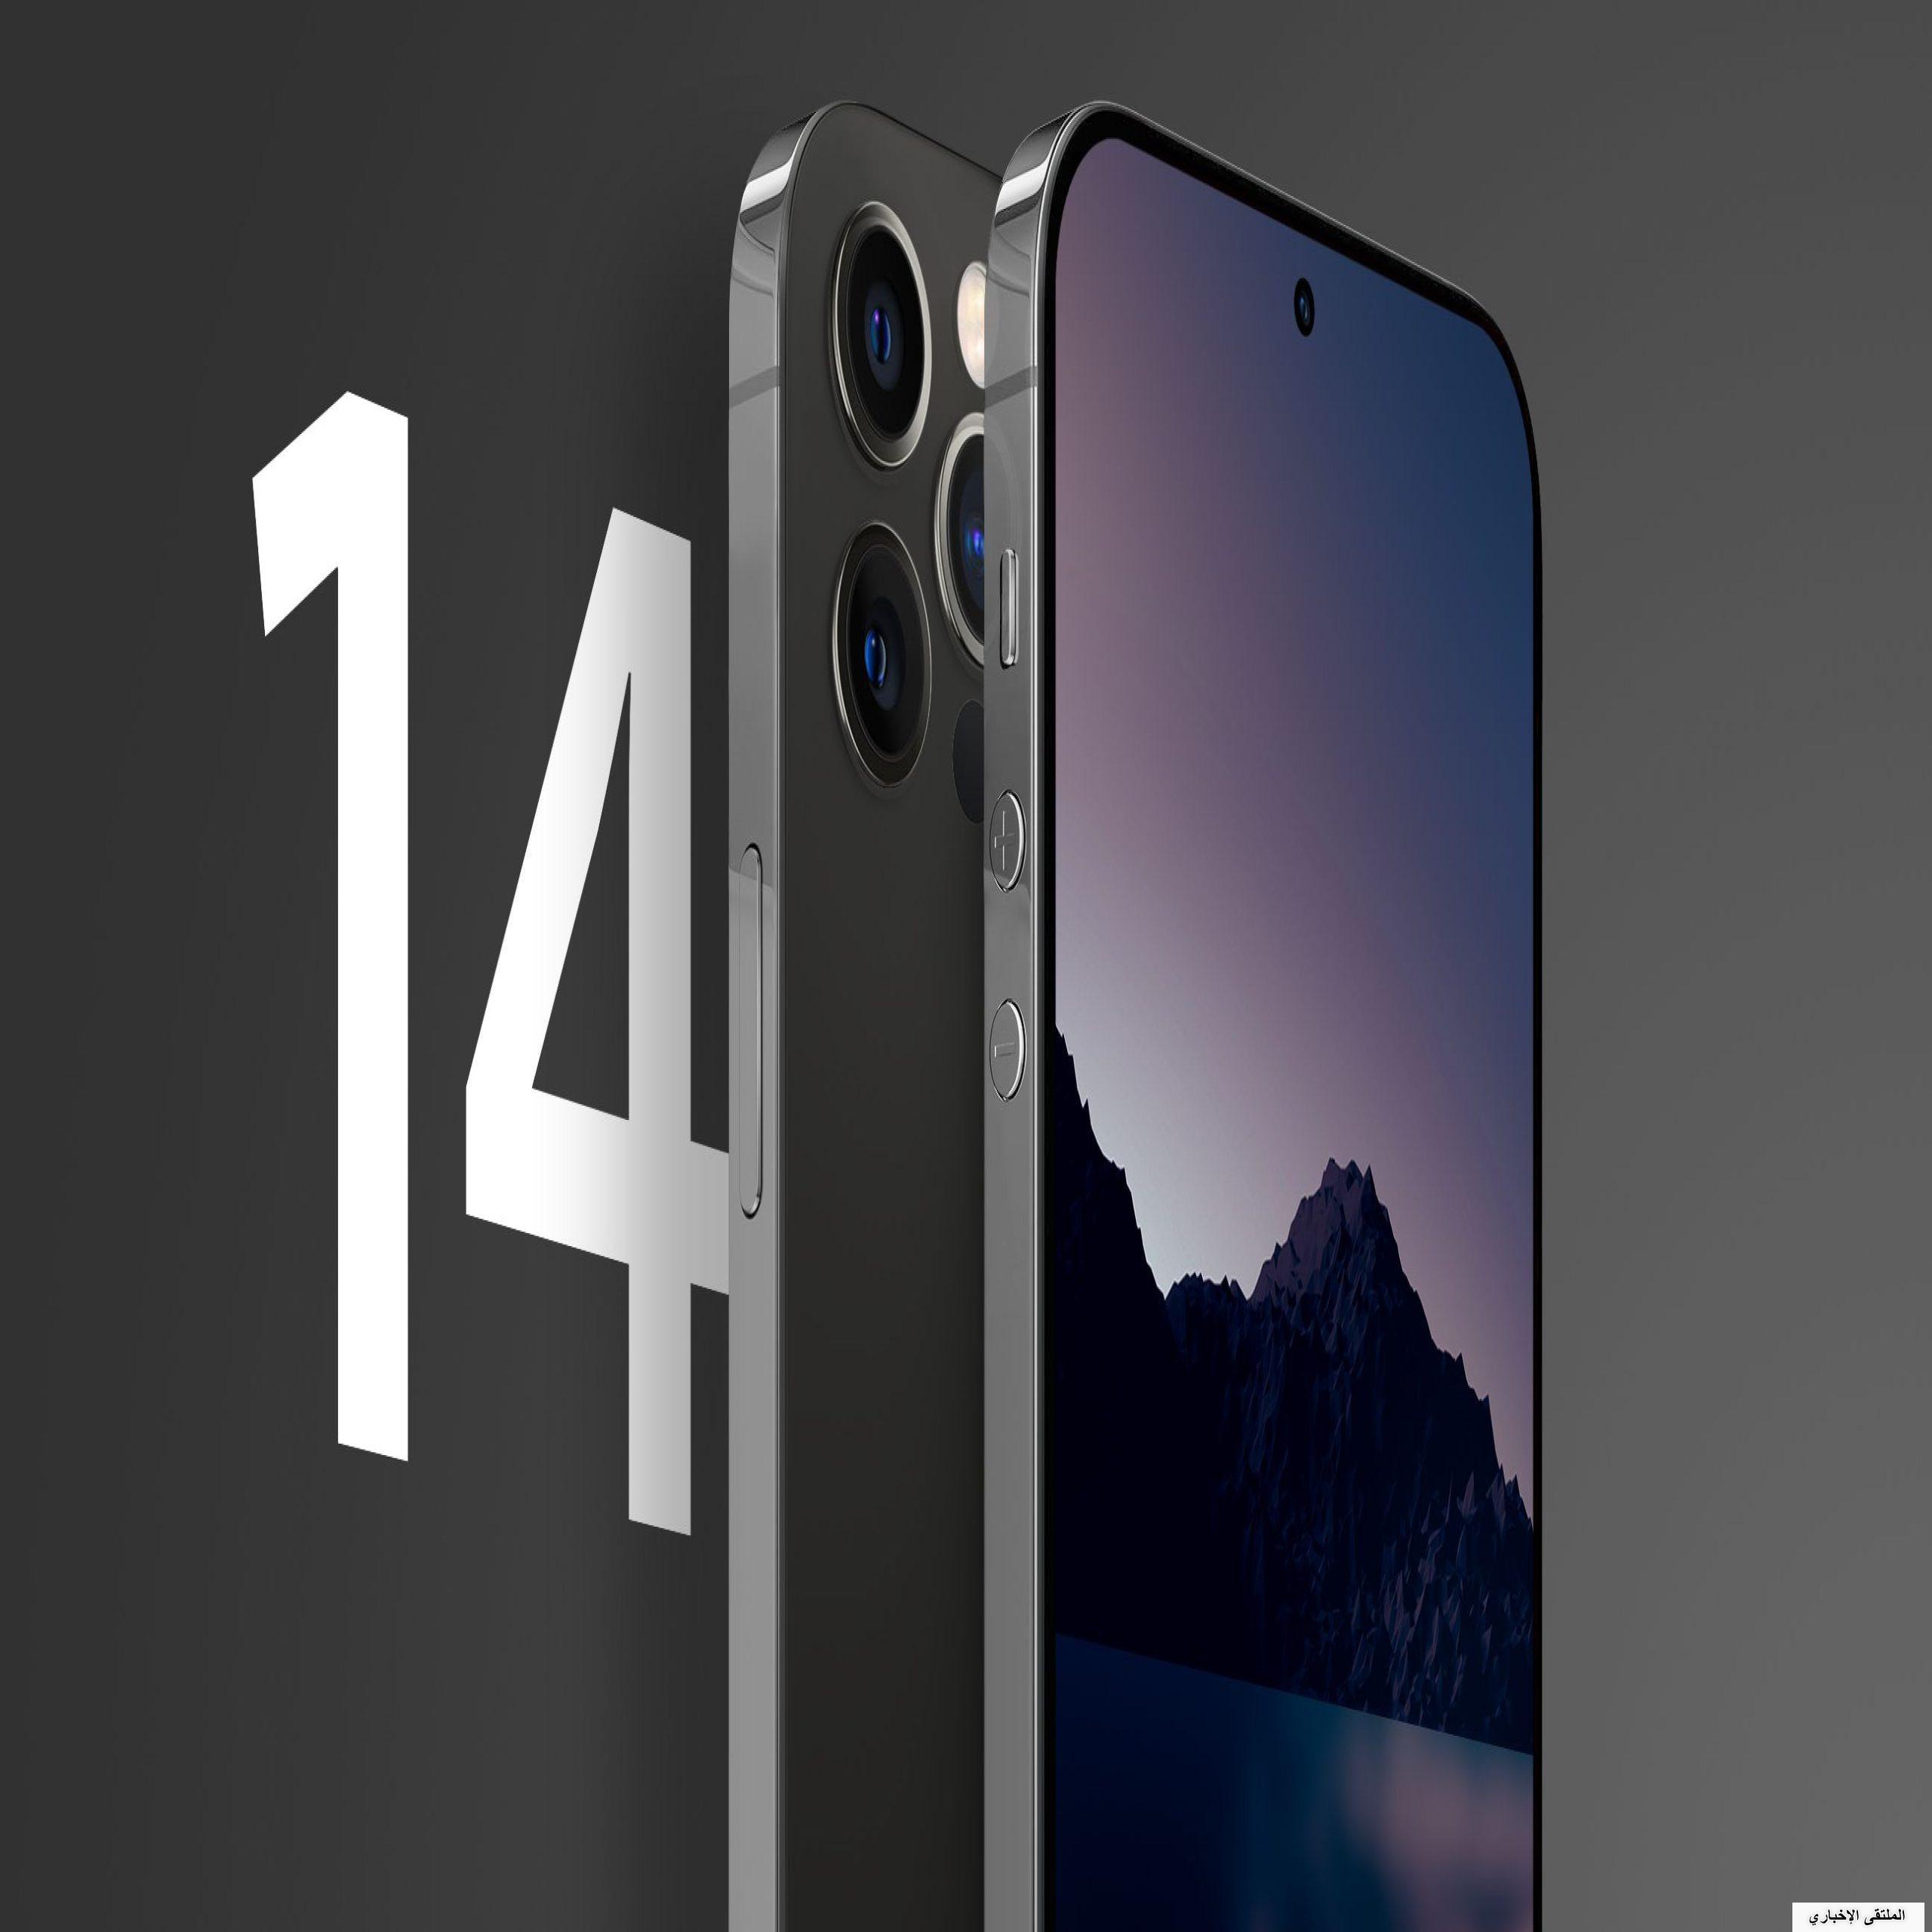 شاهد: هواتف ايفون 14 برو قد تأتي بسعة 2 تيرابايت!